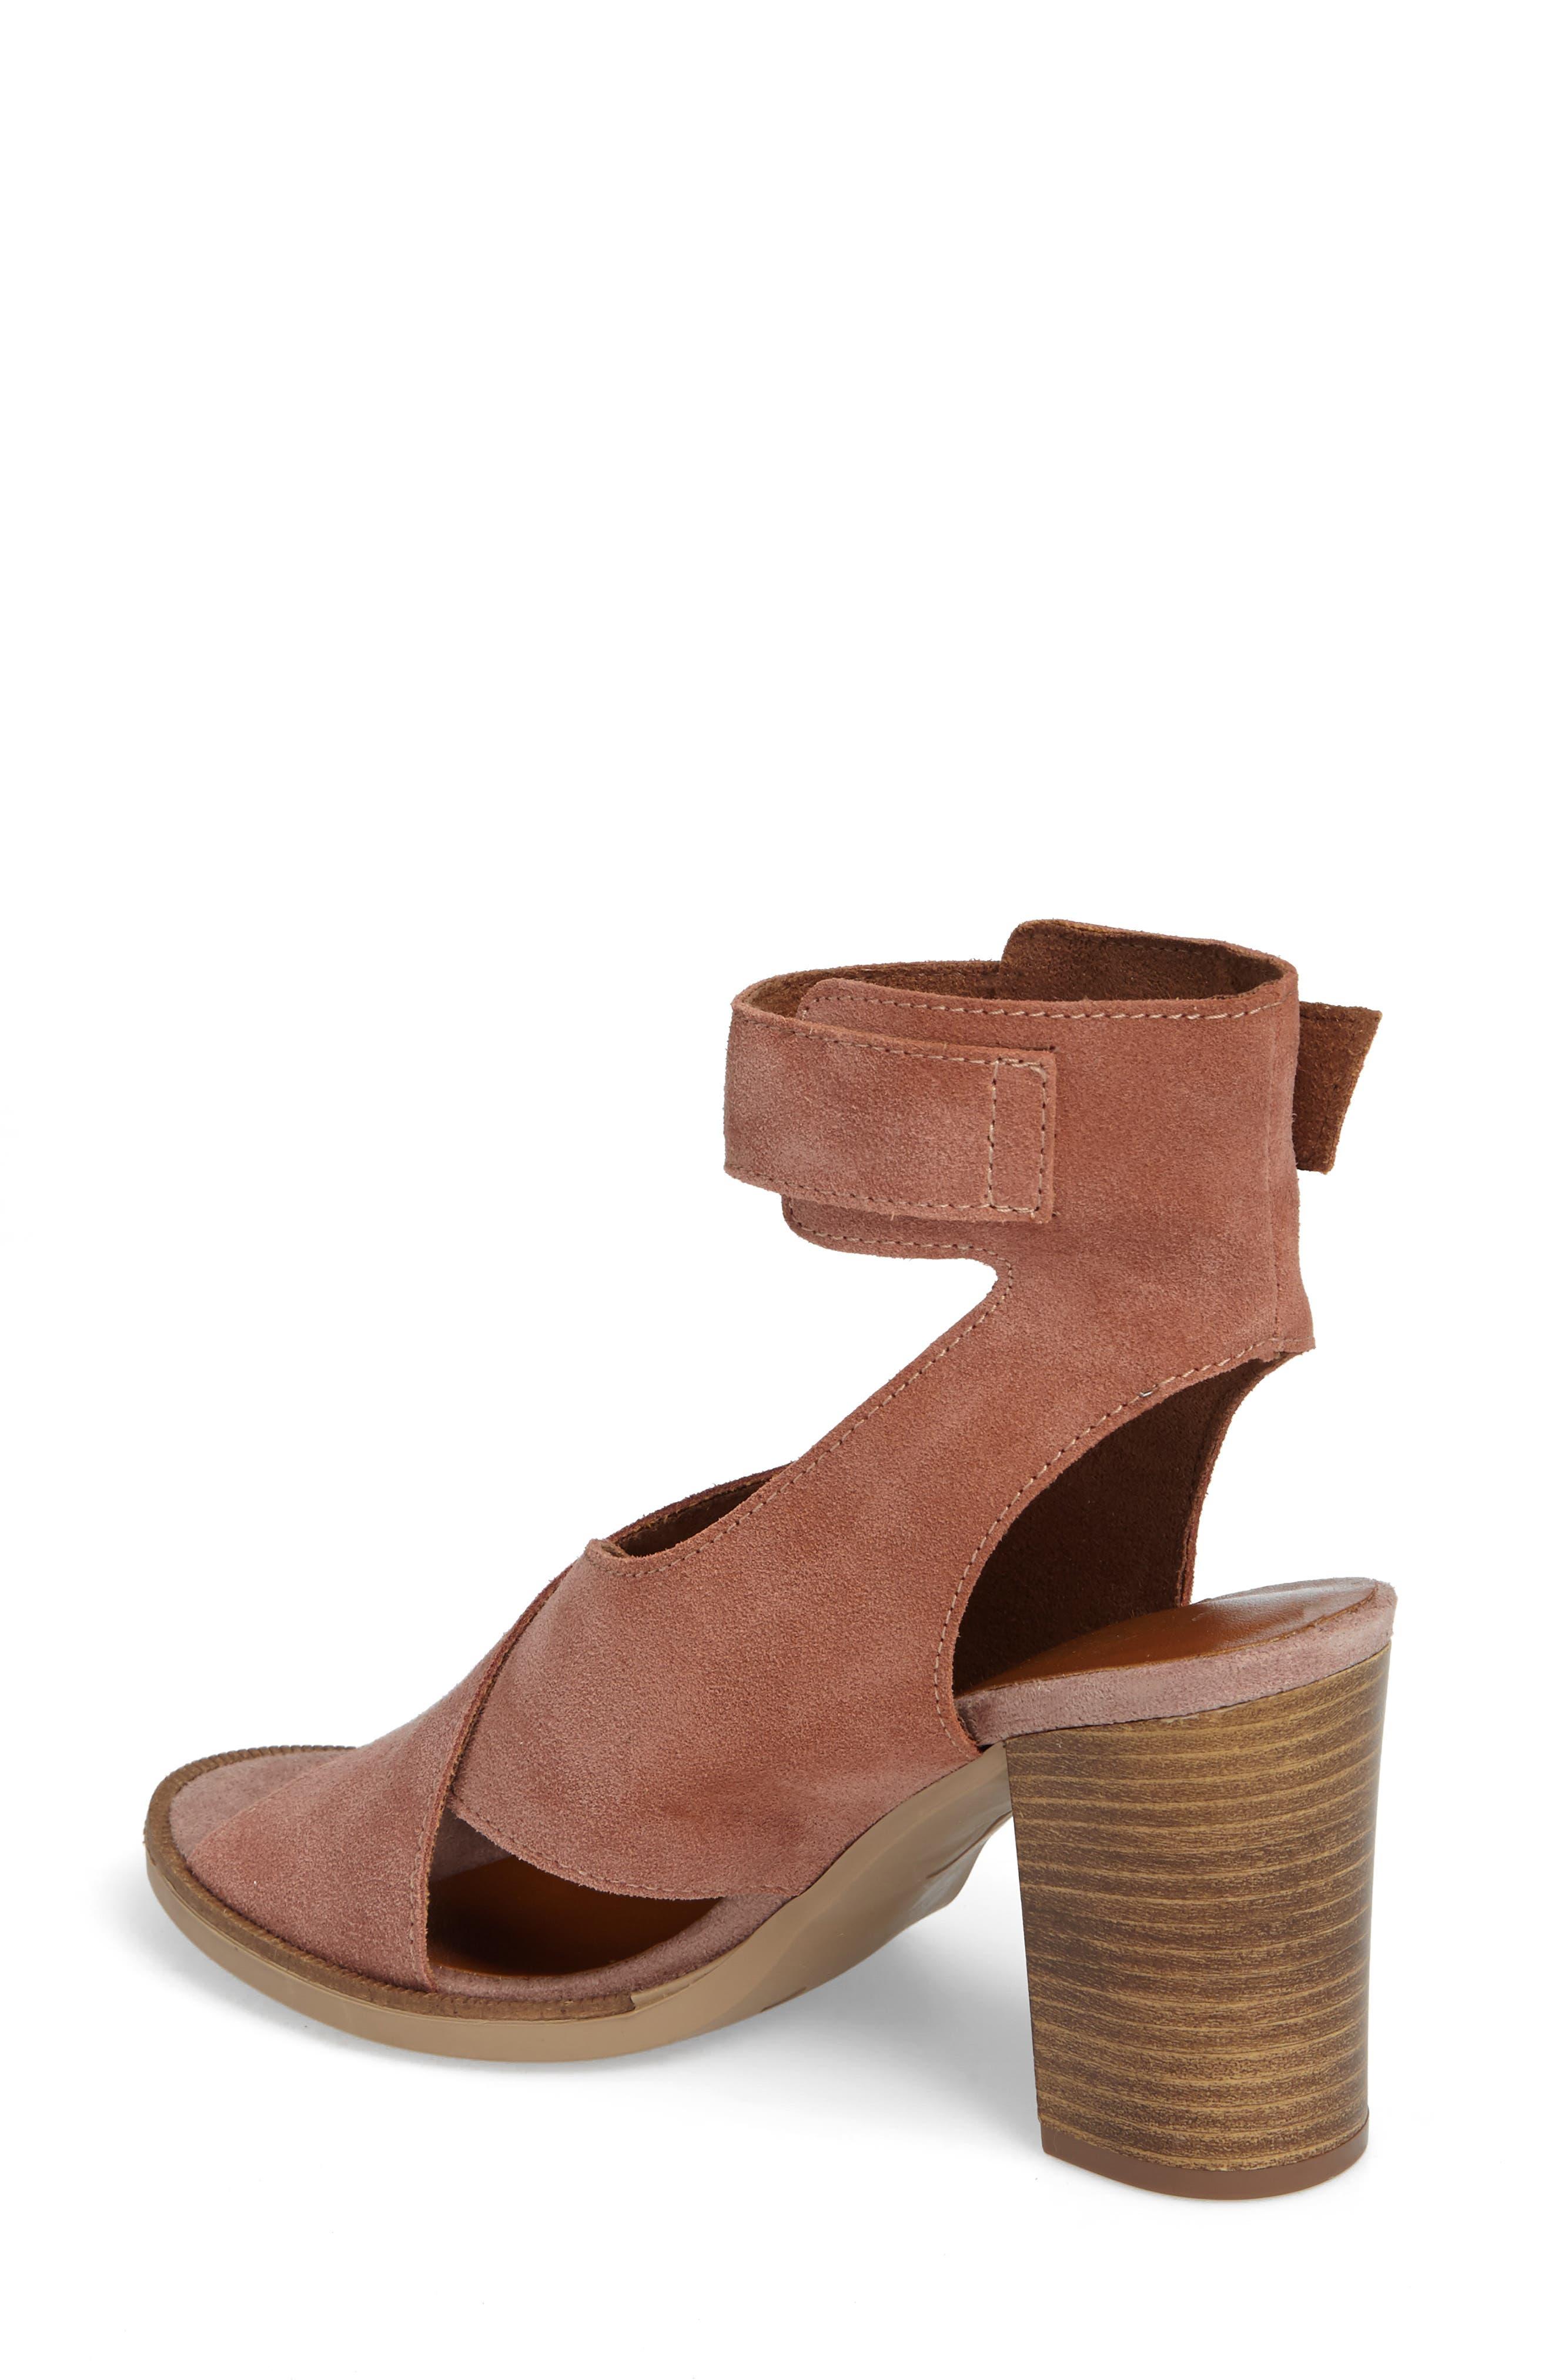 Alternate Image 2  - Bella Vita Lil Ankle Wrap Sandal (Women)